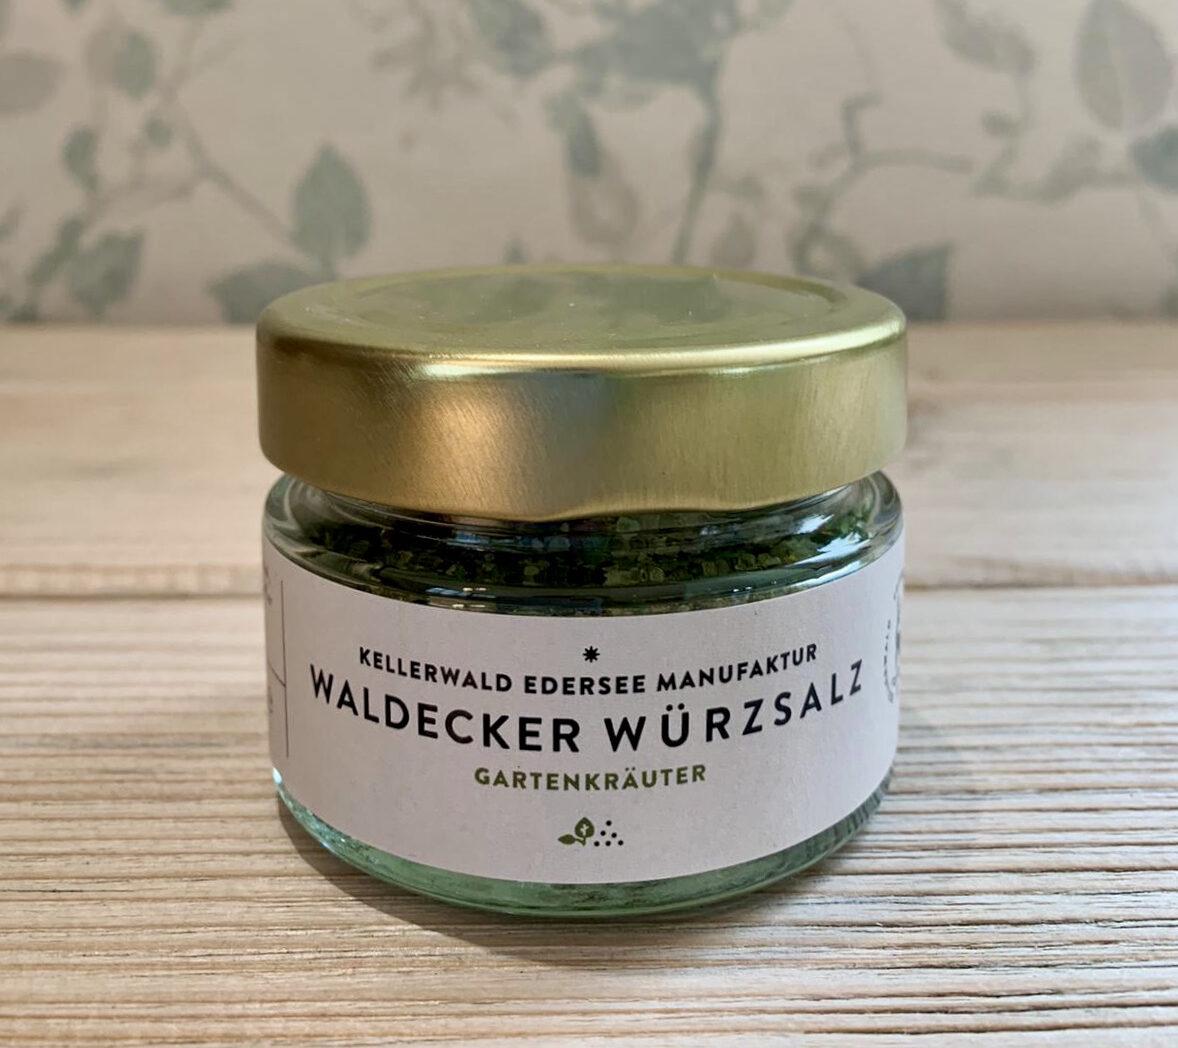 Kellerwald Edersee Manufaktur, Waldecker Würzsalz, Salz, Speisesalz, Gartenkräuter